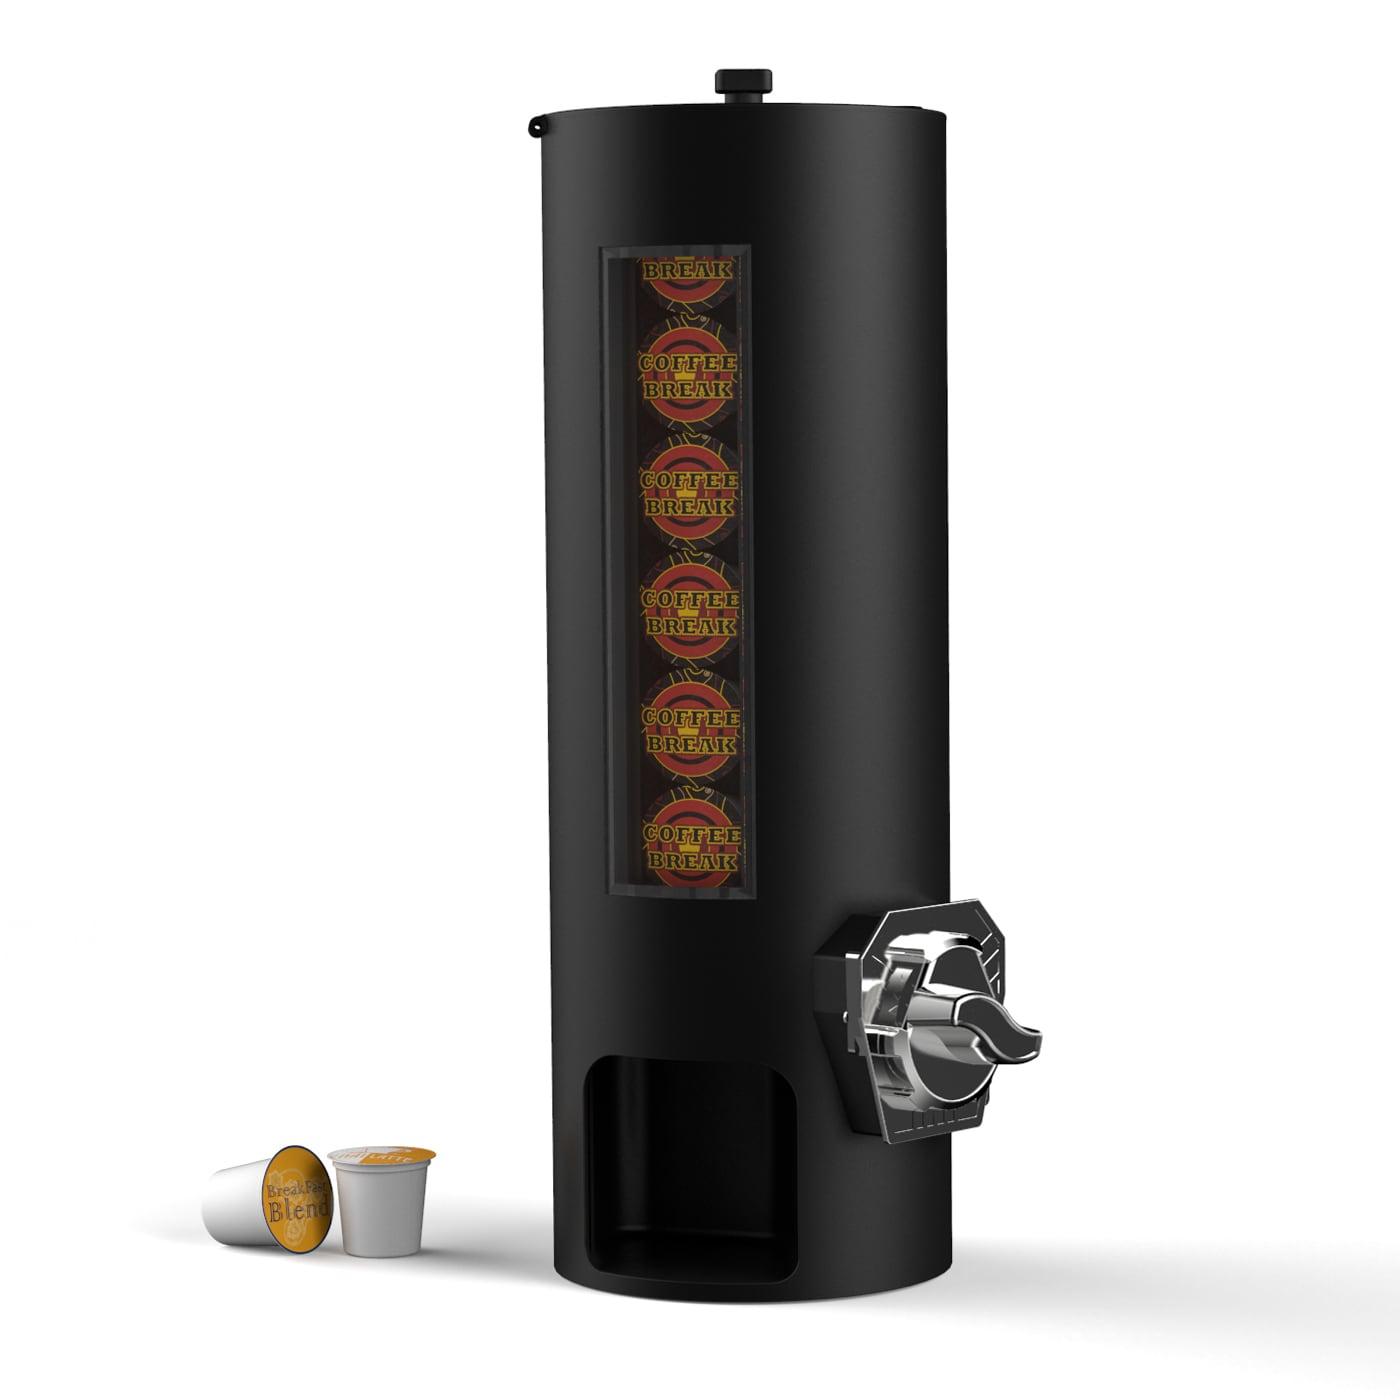 Mind Reader 'revolution' Coin operated K-Cup dispenser-Bl...